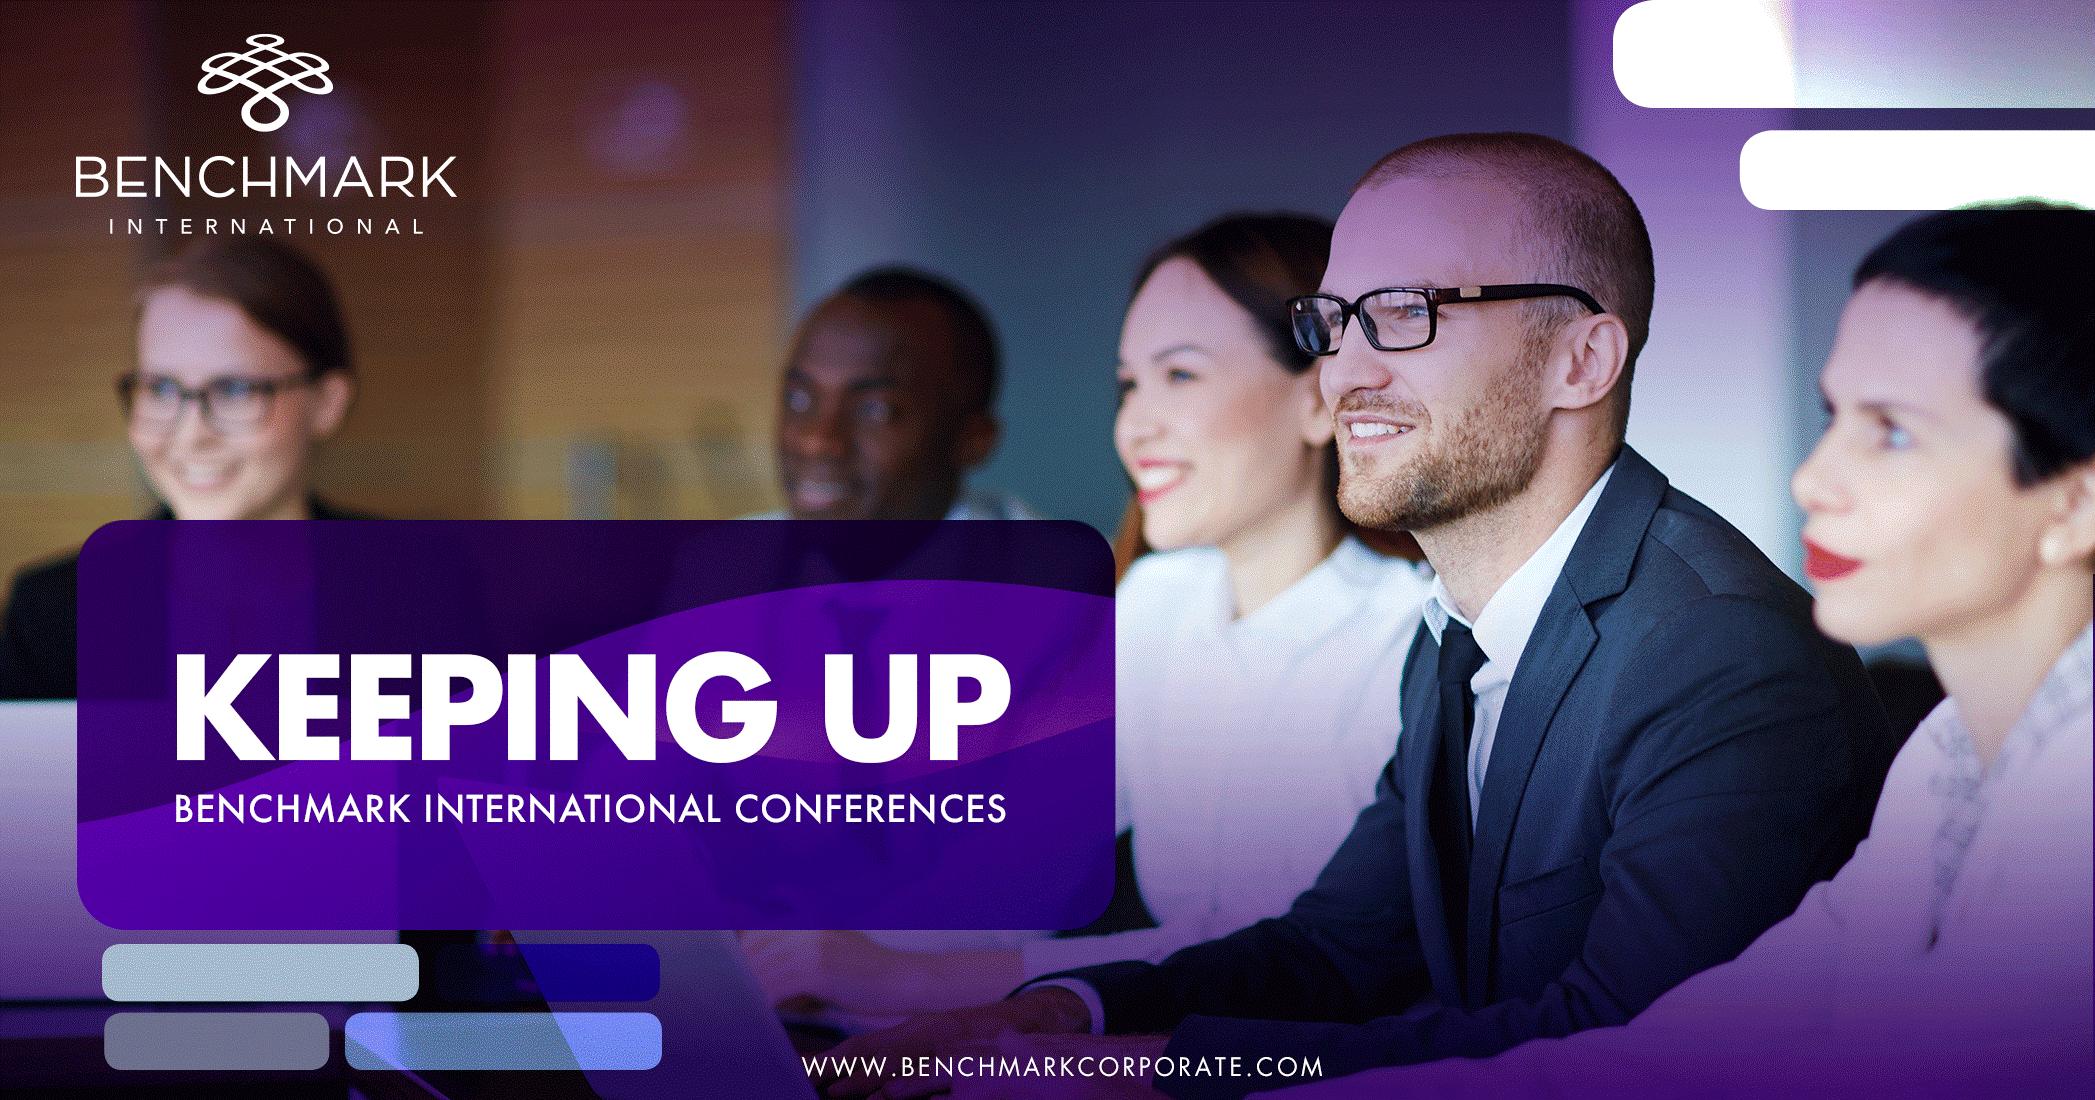 Keeping Up: Benchmark International Conferences